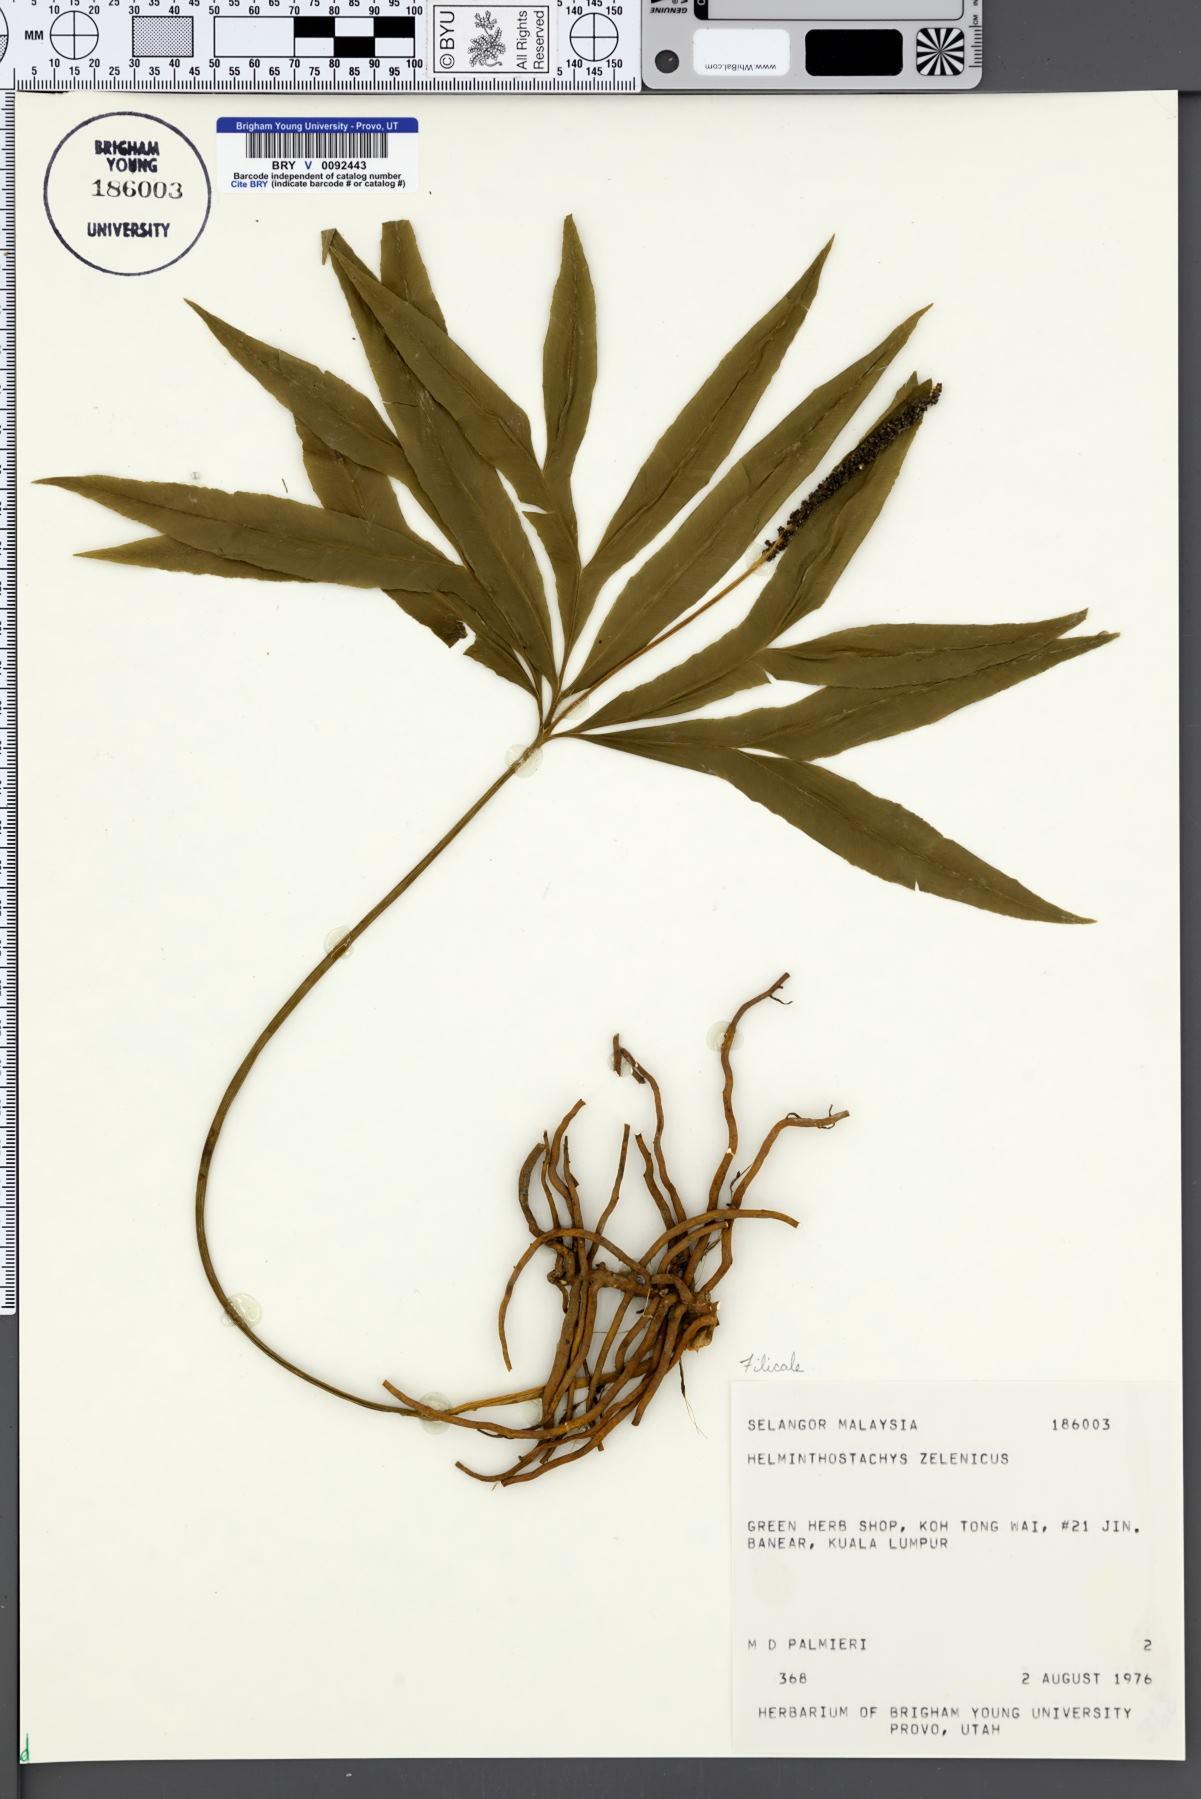 Helminthostachys sp, Helminthostachys sp